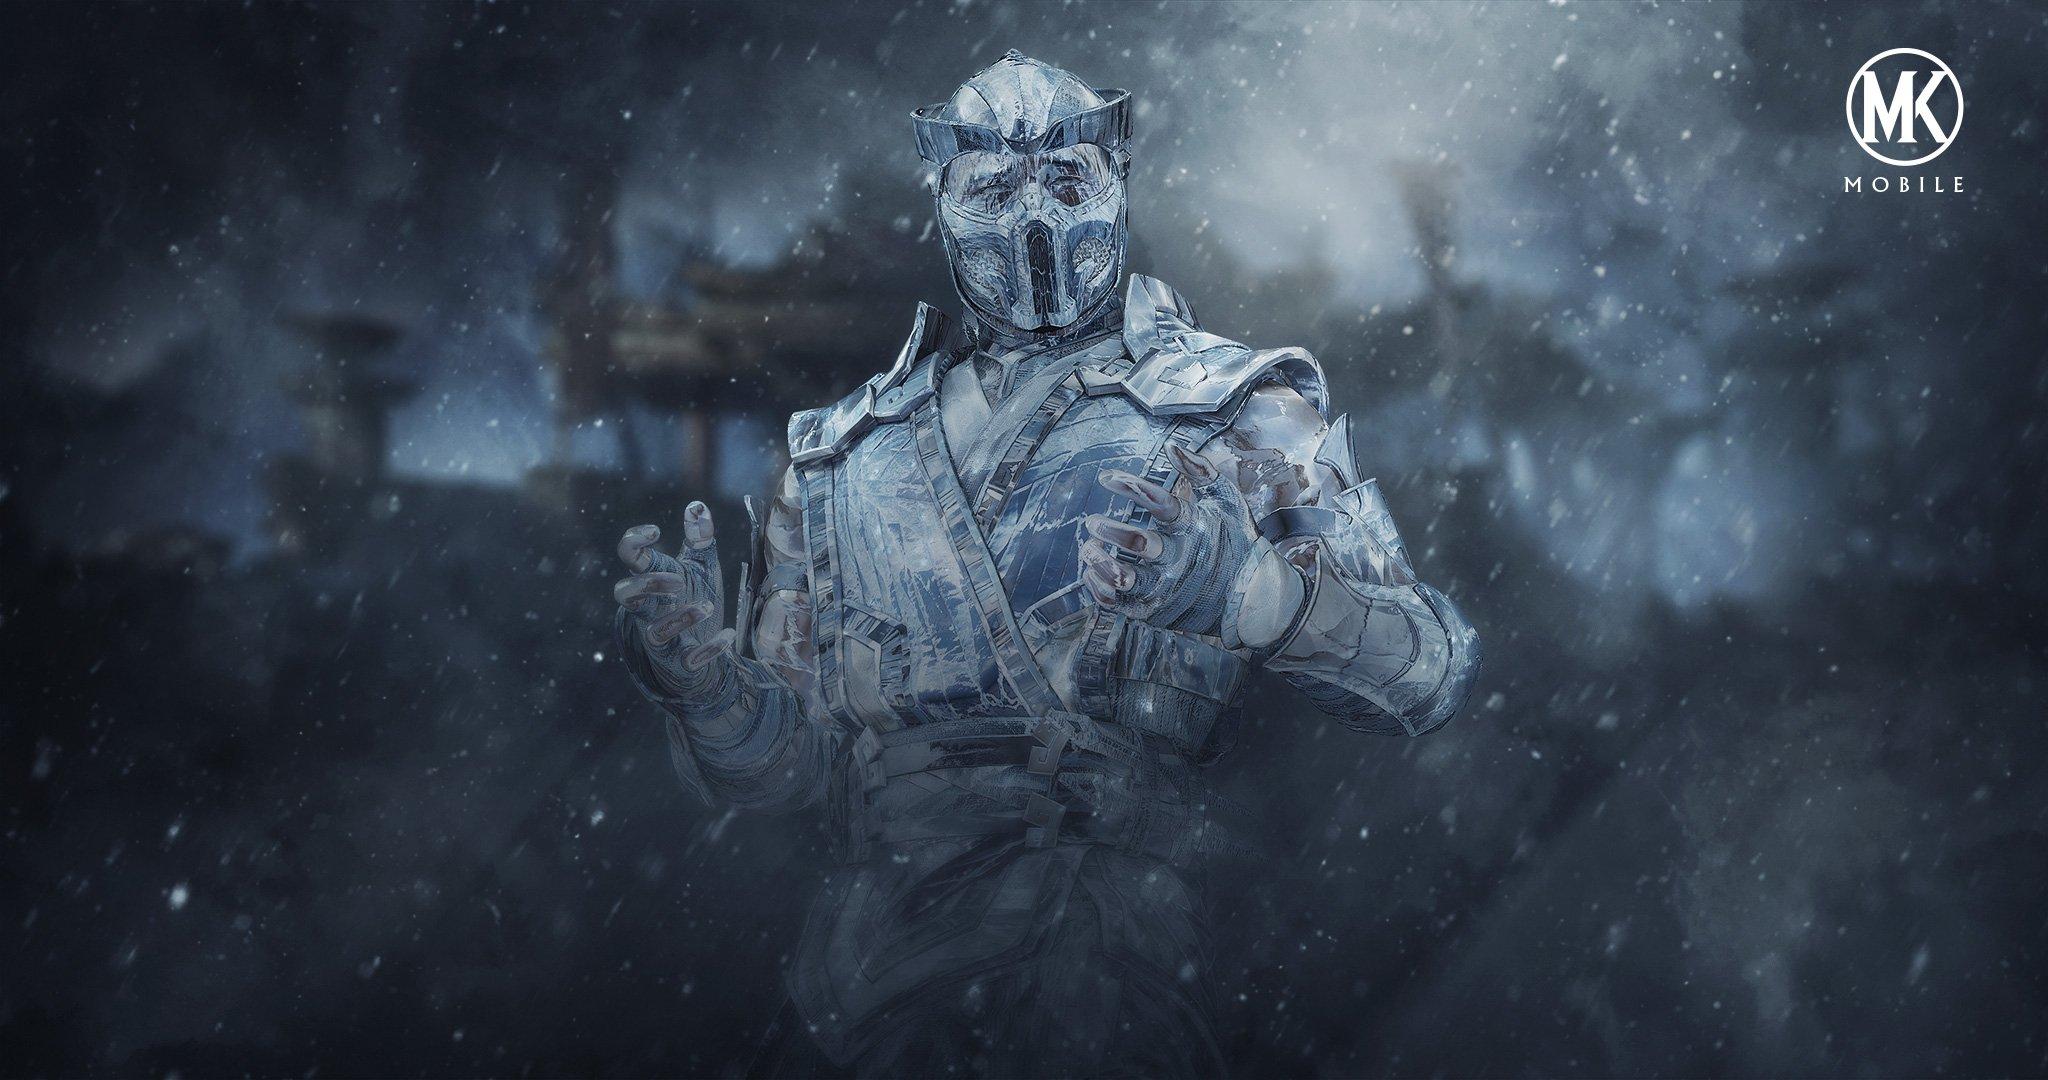 MK:Mobile background - Frozen Sub-Zero